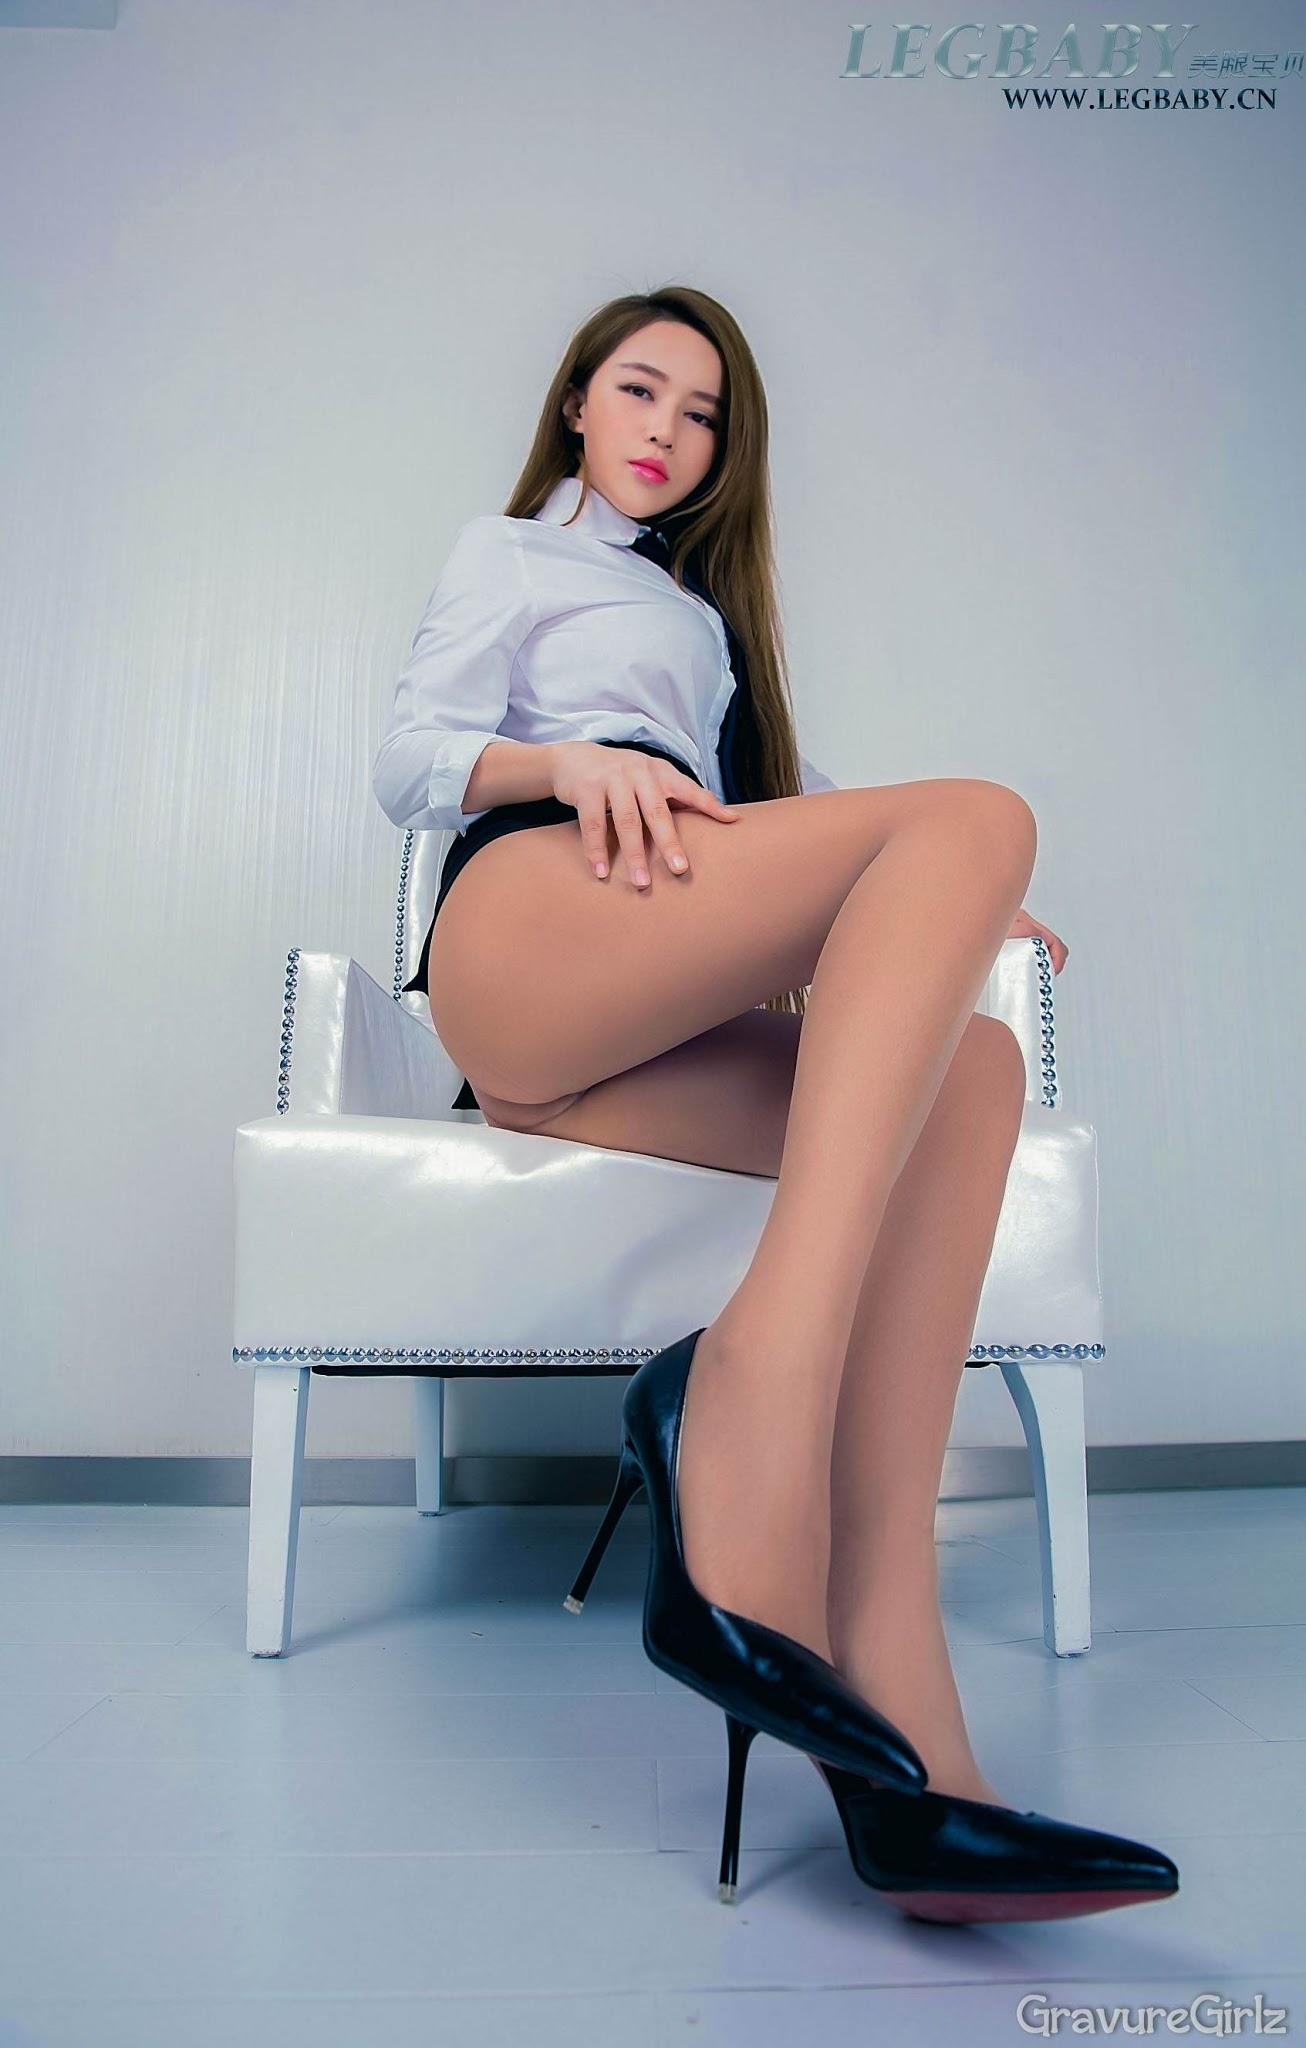 Rouxi 若兮 LEGBABY NO.009 Clear Pantyhose